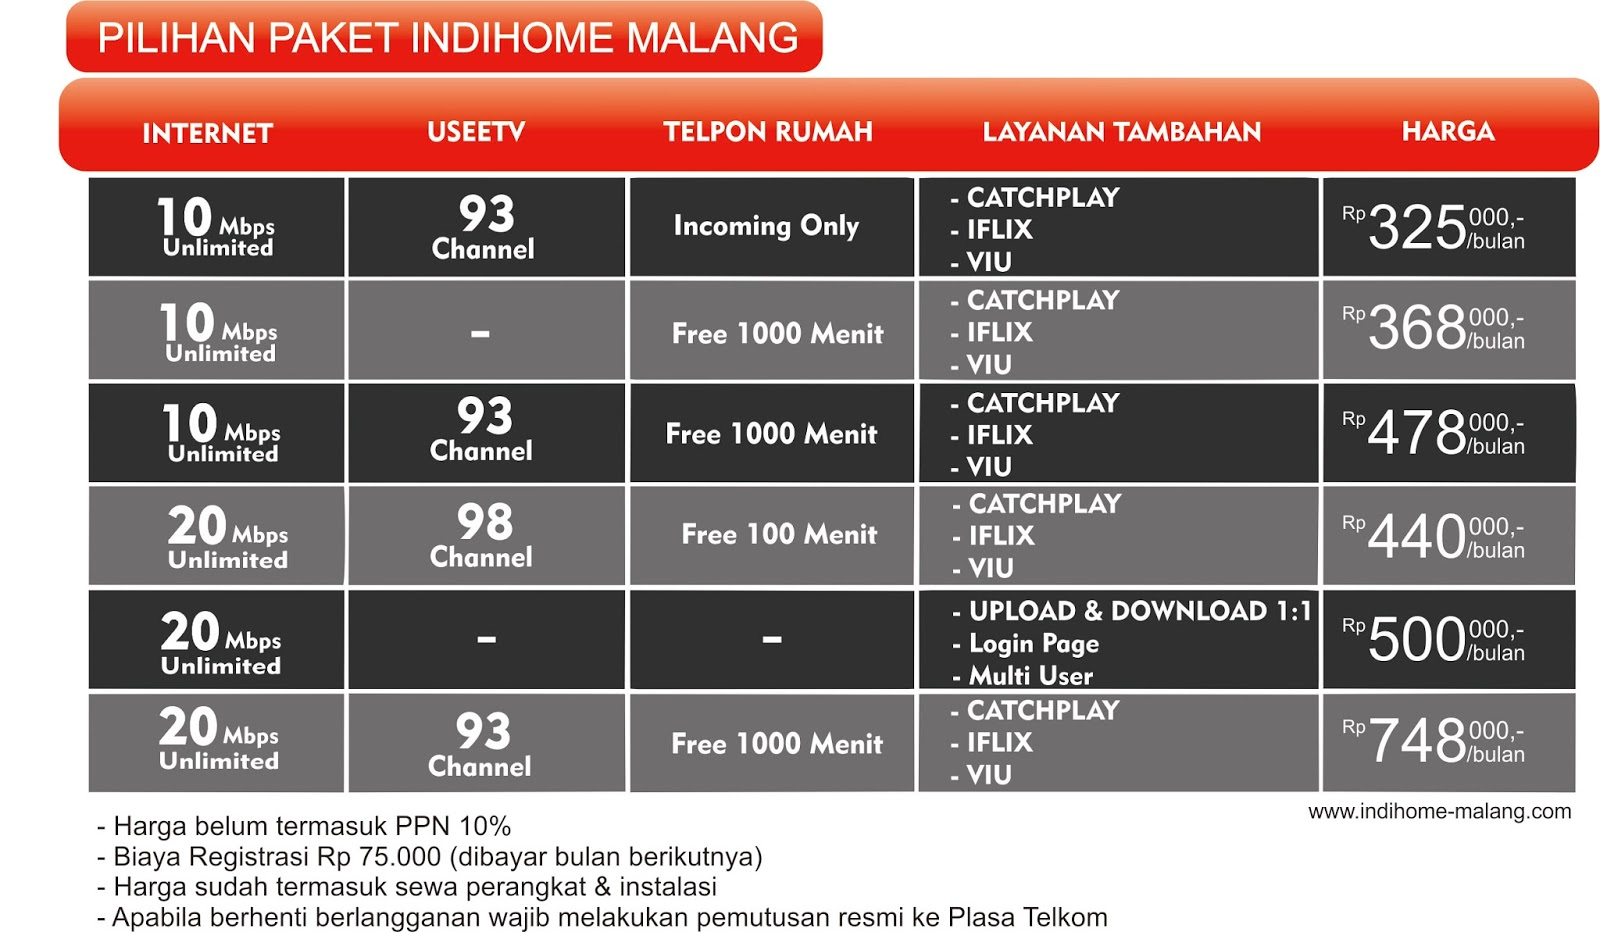 Fourth image of Indihome Kota Malang Promo Indihome 2015 Malang with MARKETING TELKOM INDIHOME MALANG: PROMO PAKET INDIHOME ...